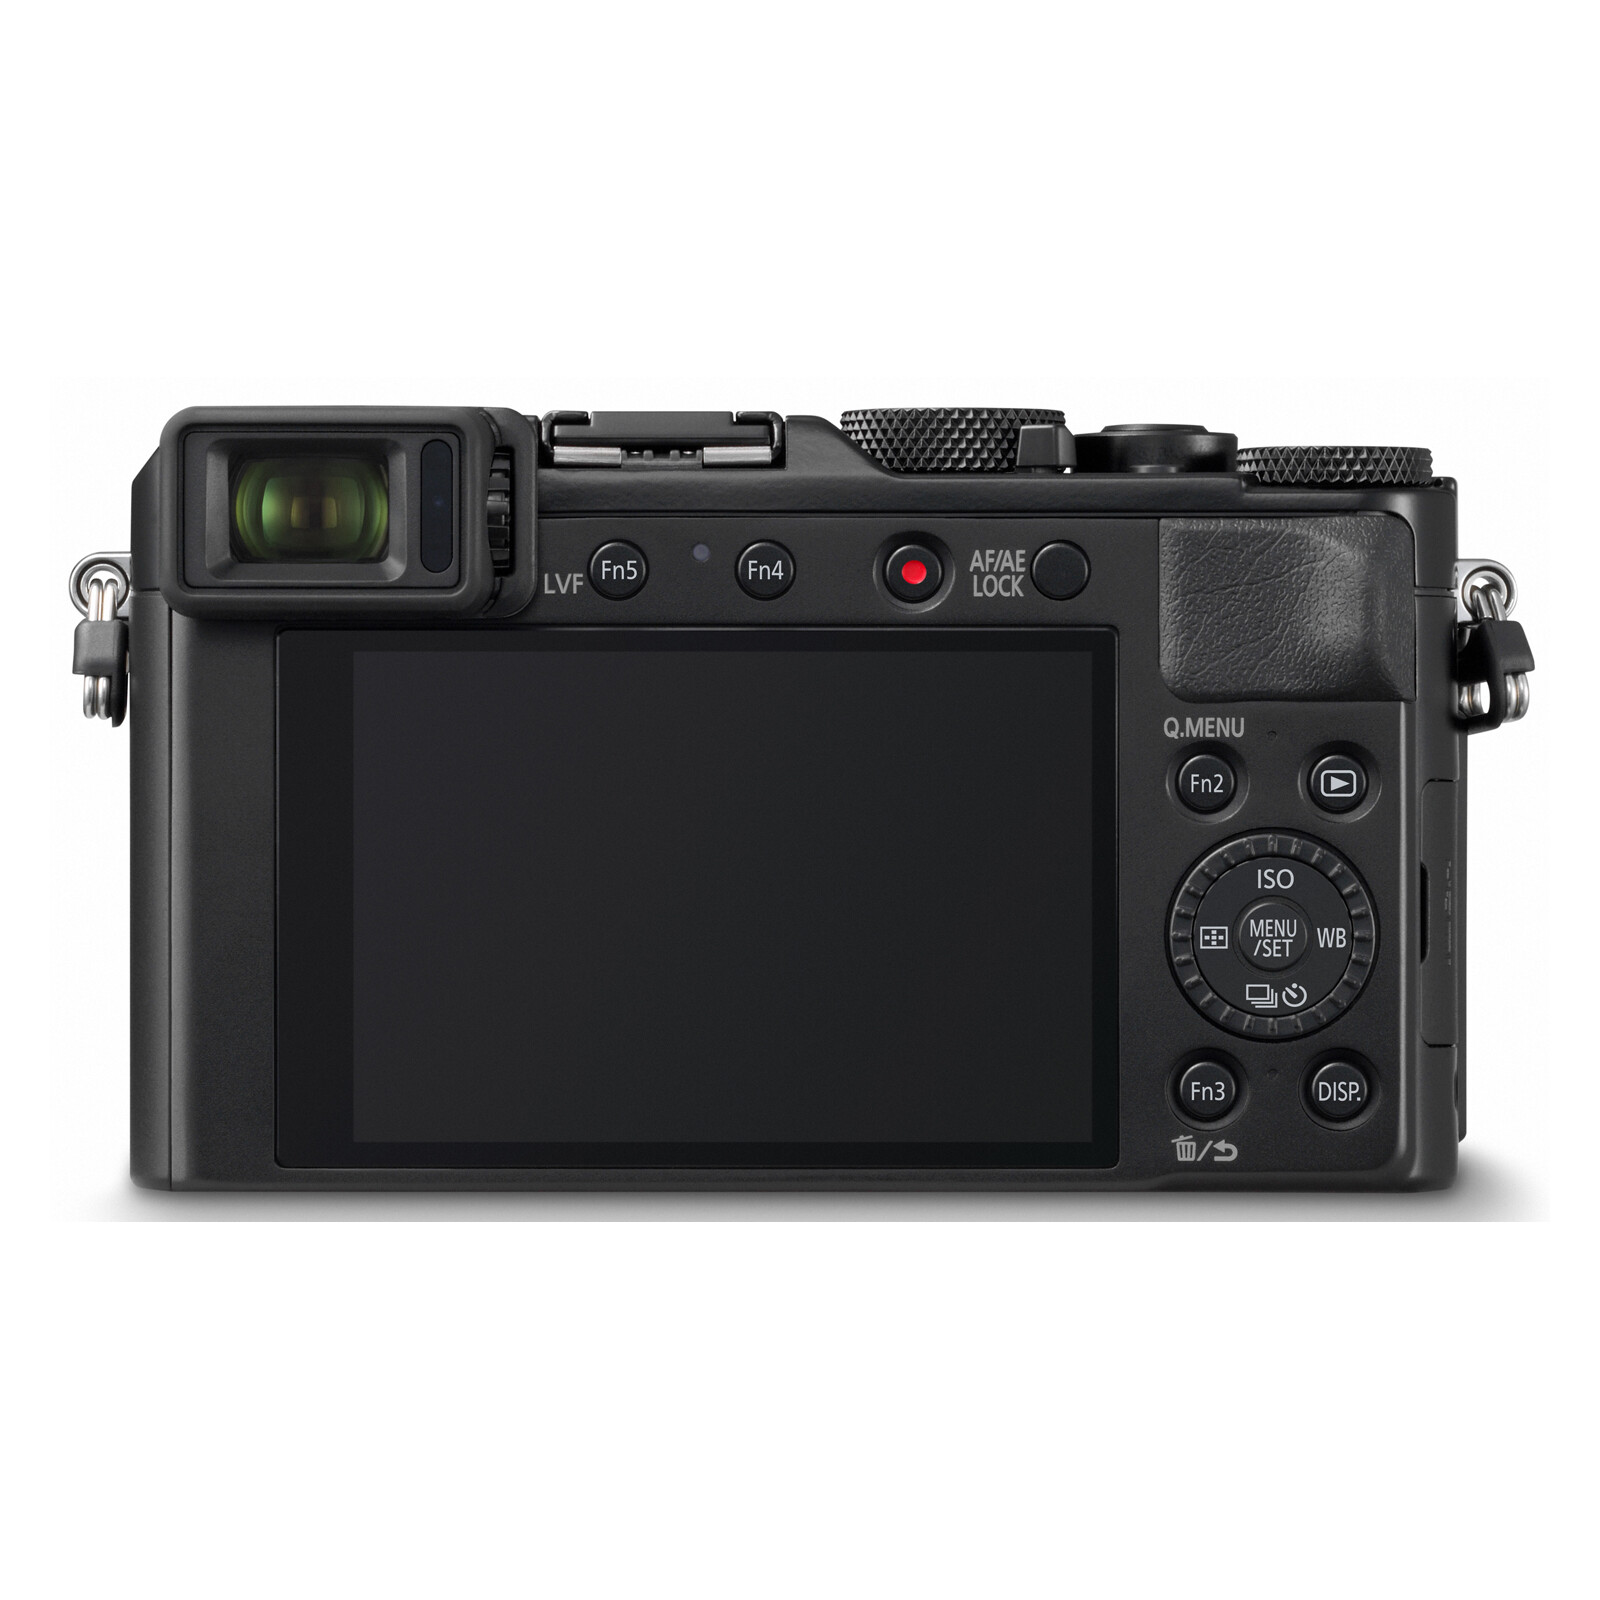 Panasonic DC-LX100M2EG Black